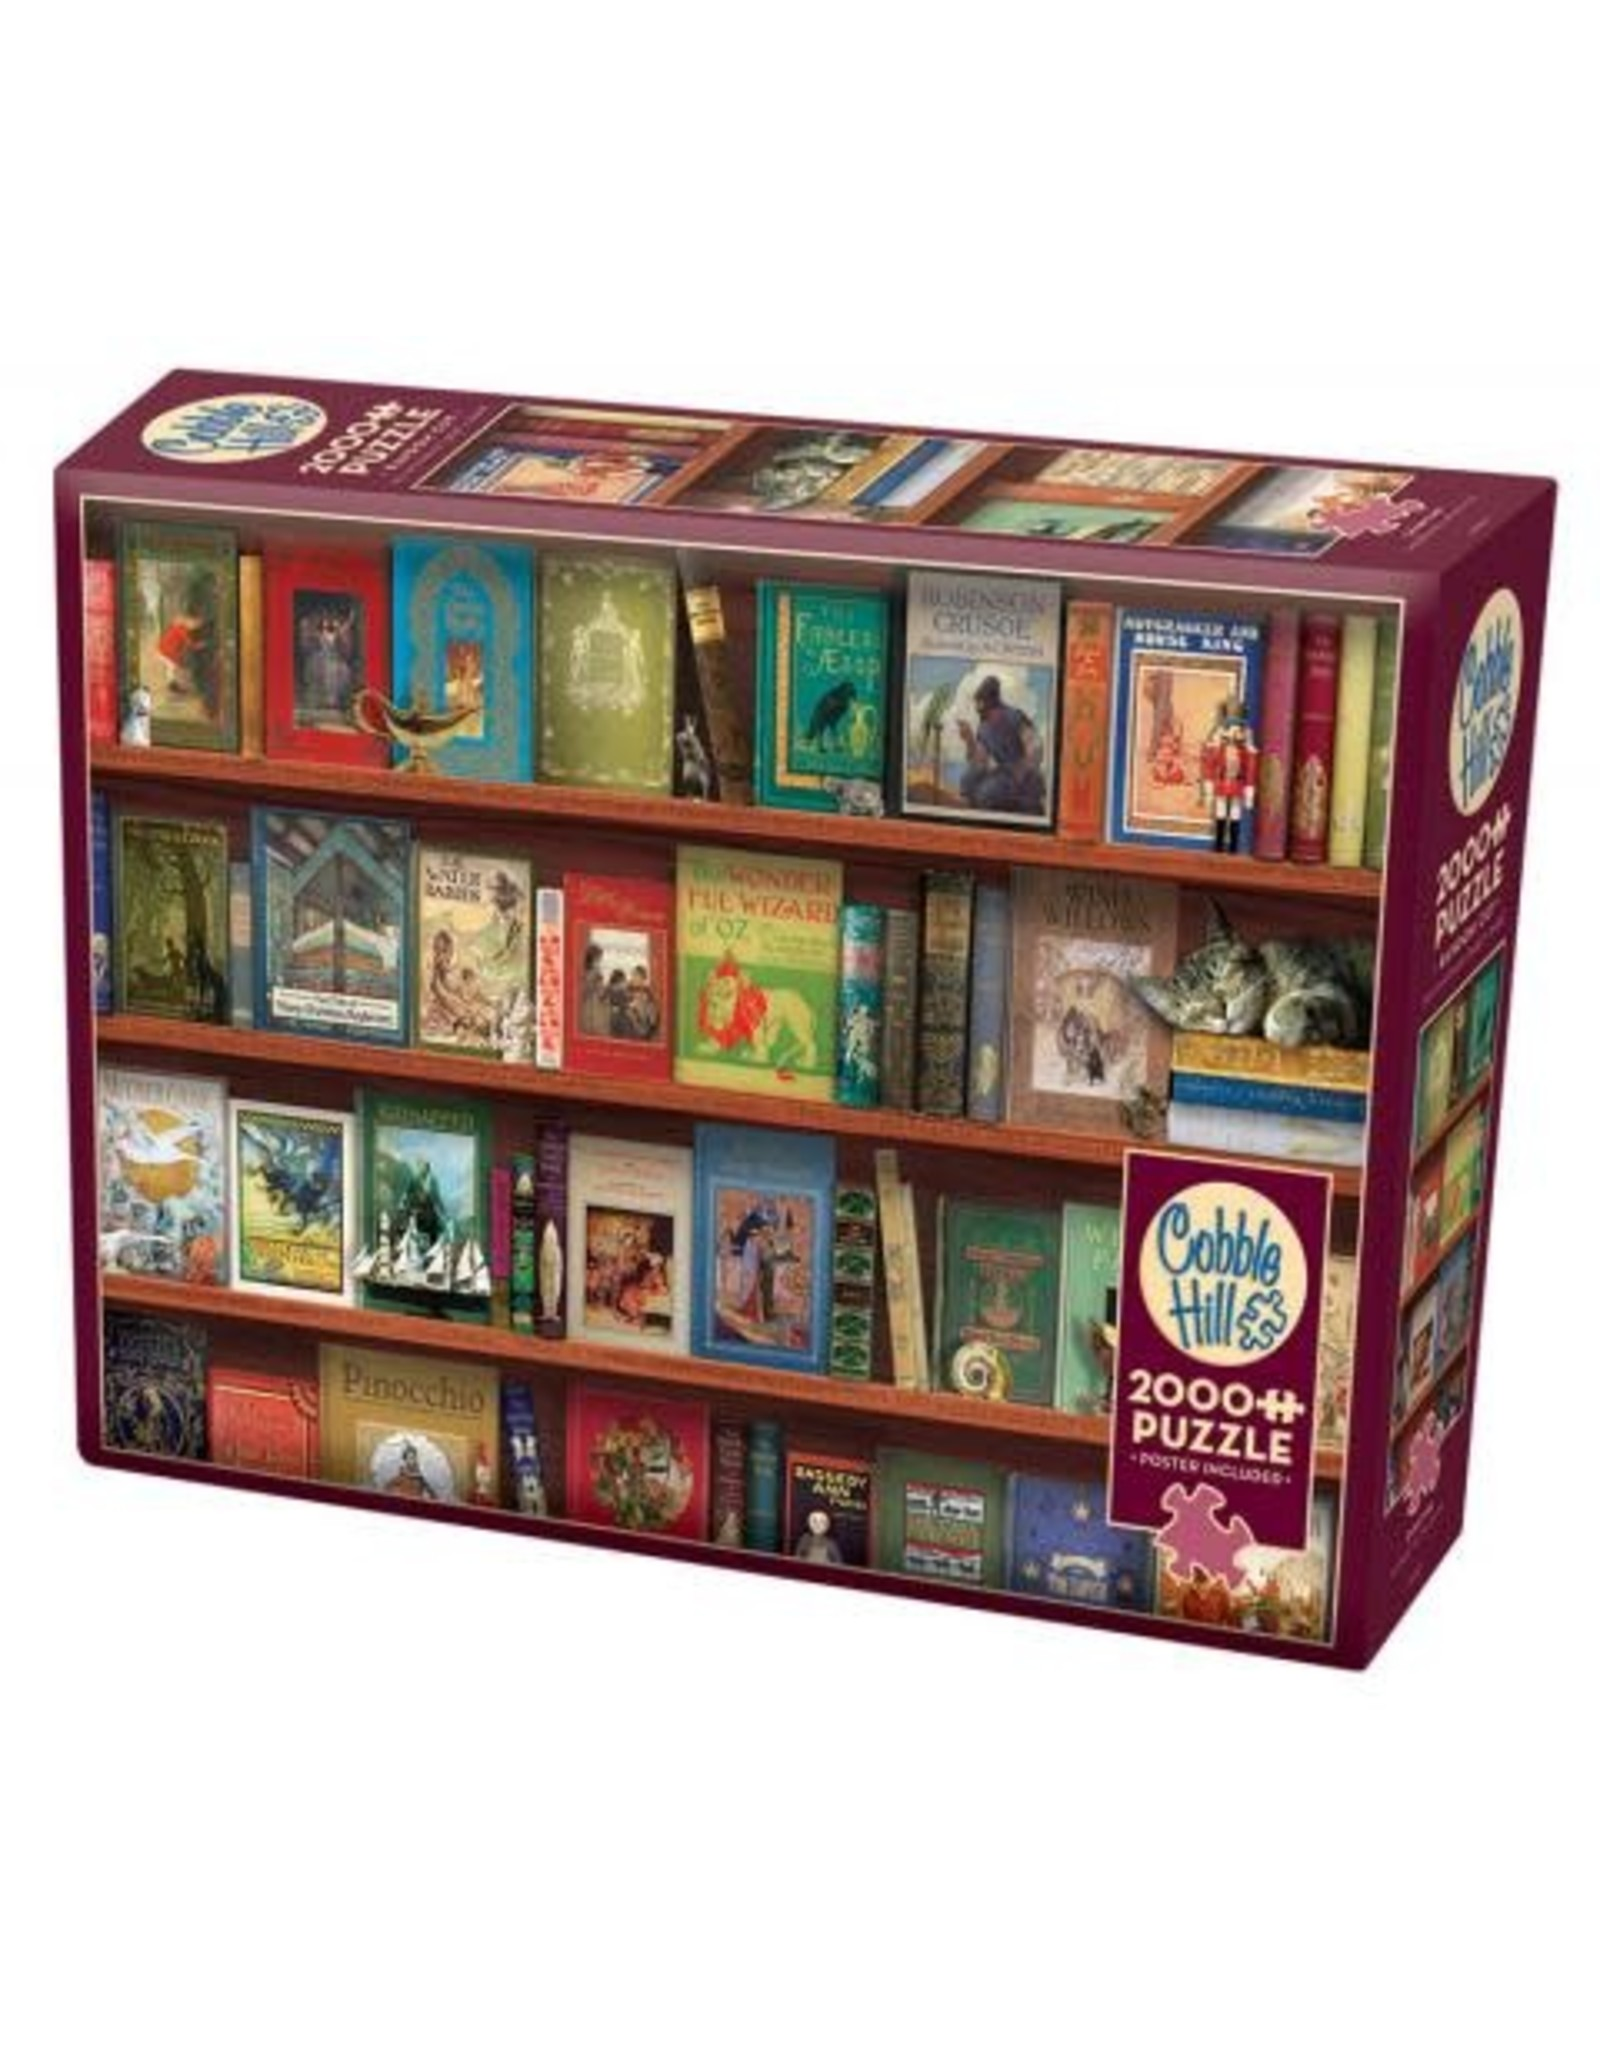 Cobble Hill Storytime 2000pc Puzzle